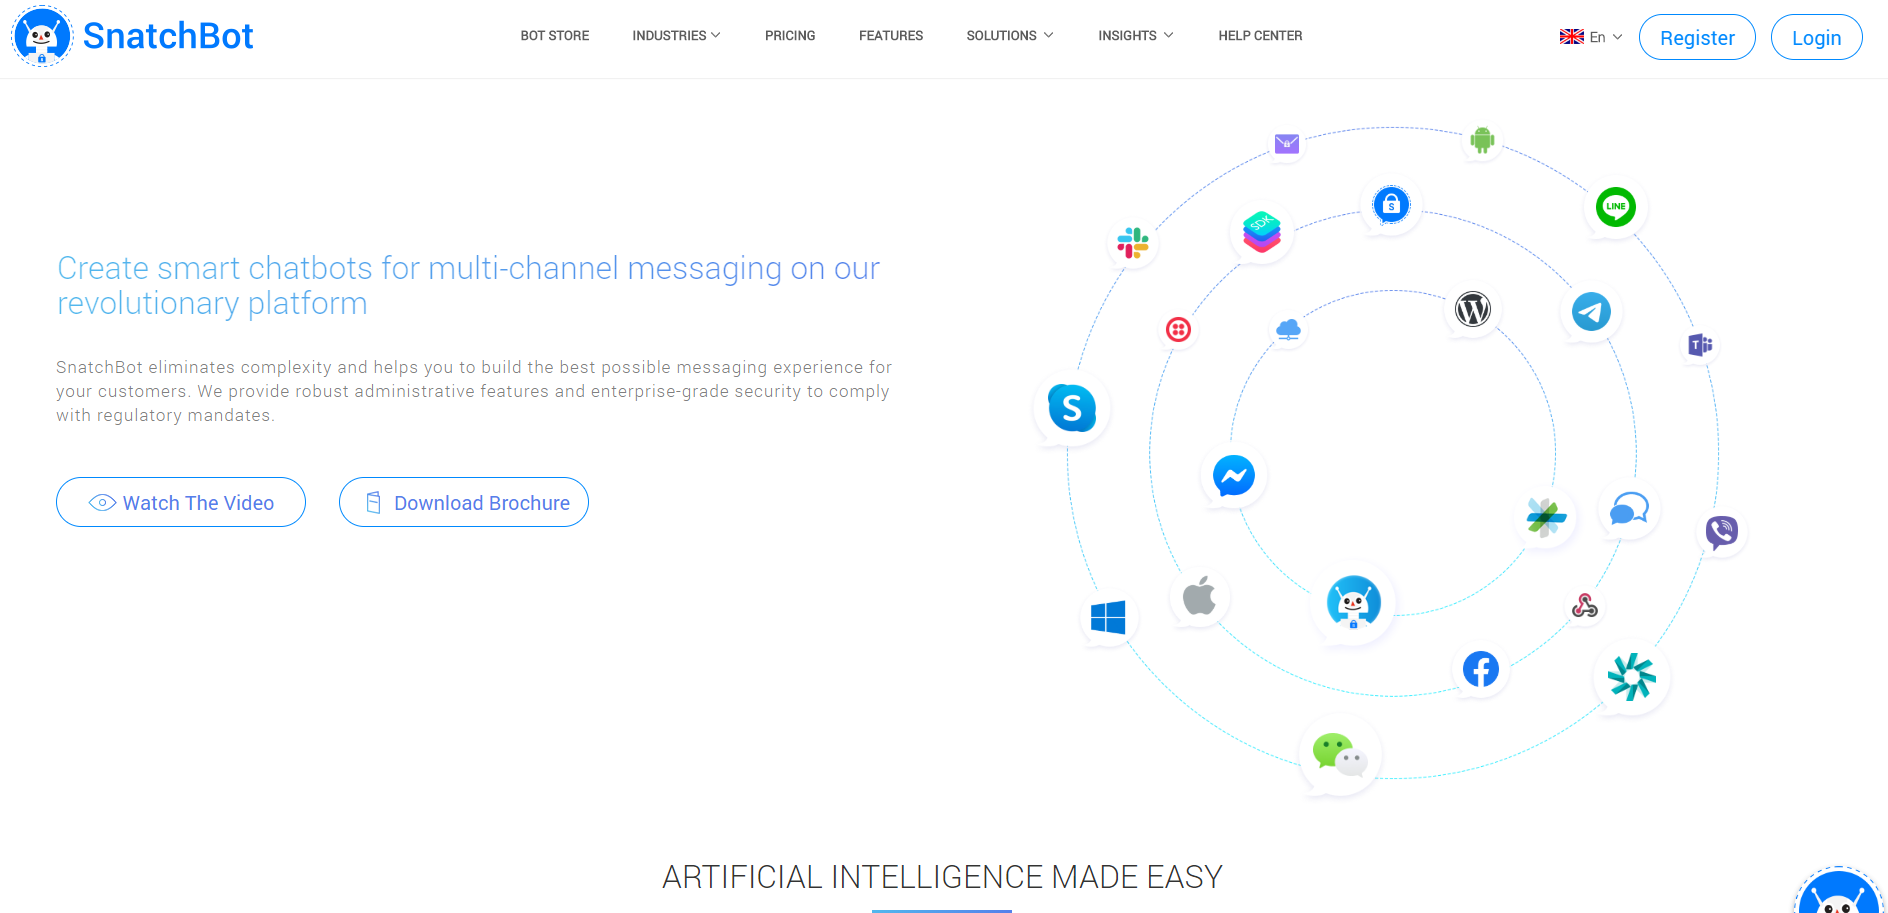 best enterprise chat software - Snatchbot